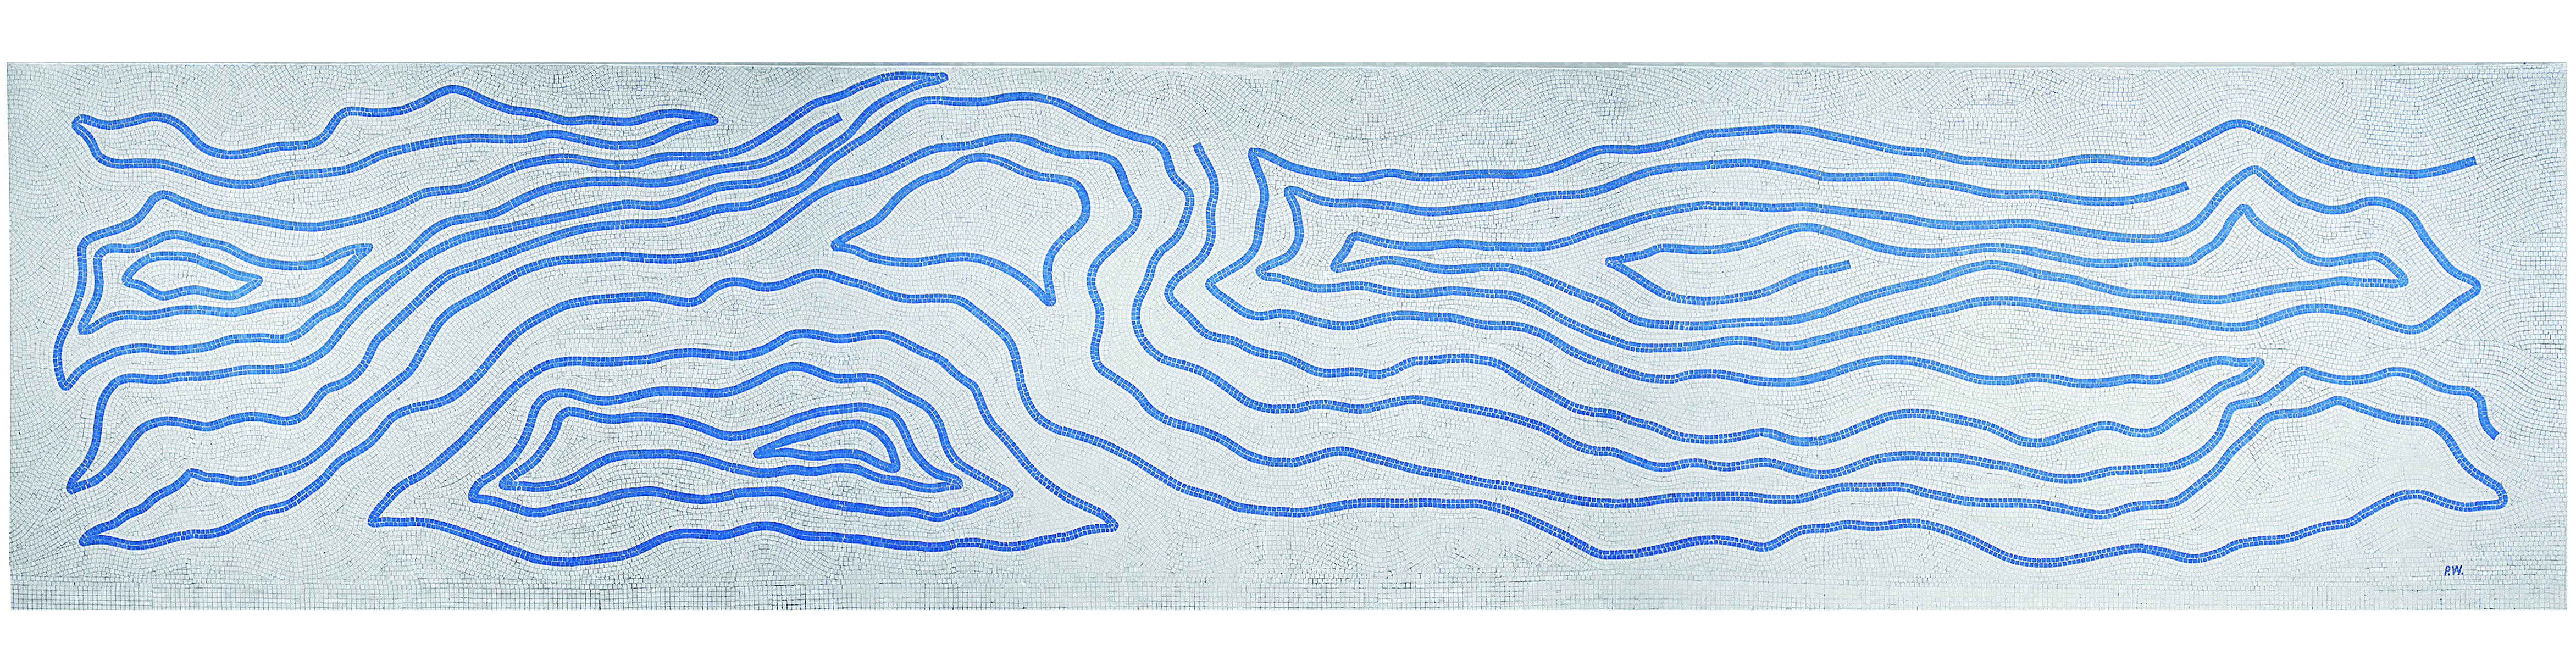 Sem Título Autor Paulo Werneck Técnica: Mosaico em pastilha de cerâmica  Dimensões: 2,54m x 12m